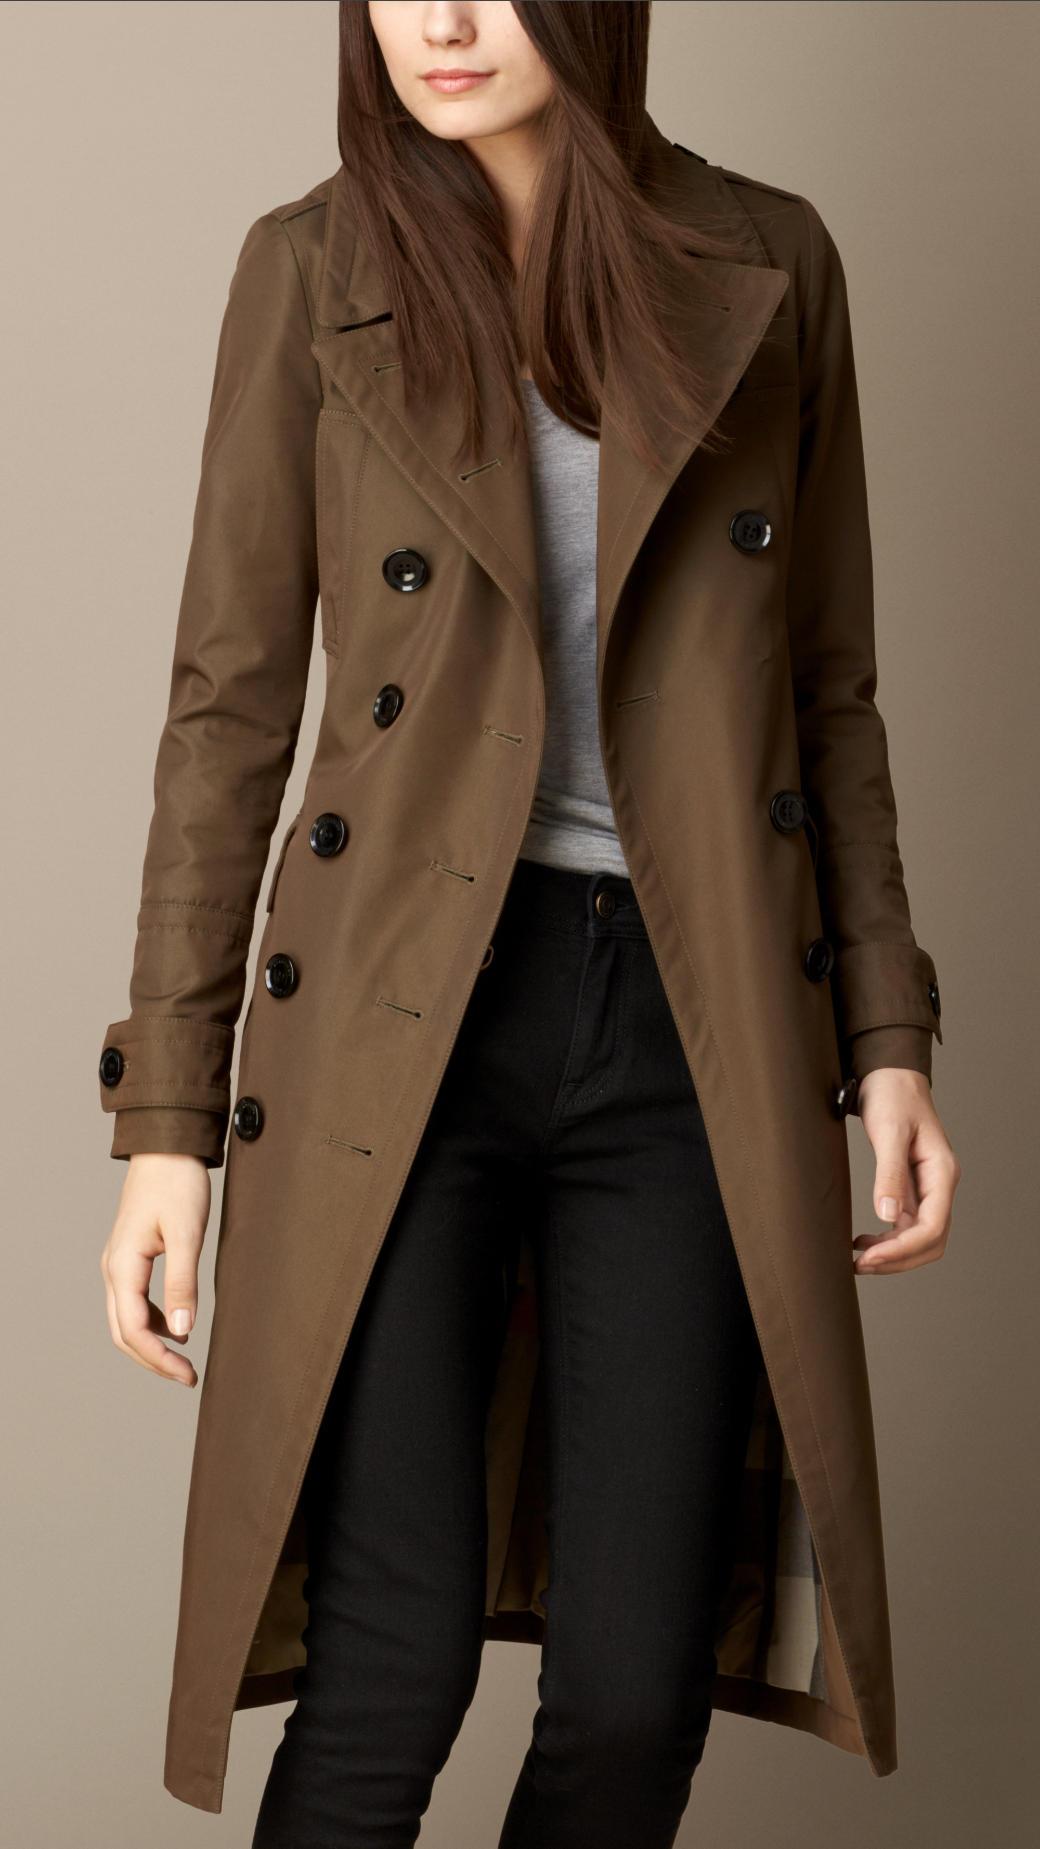 Burberry Fur Detail Military Coat in Natural | Lyst